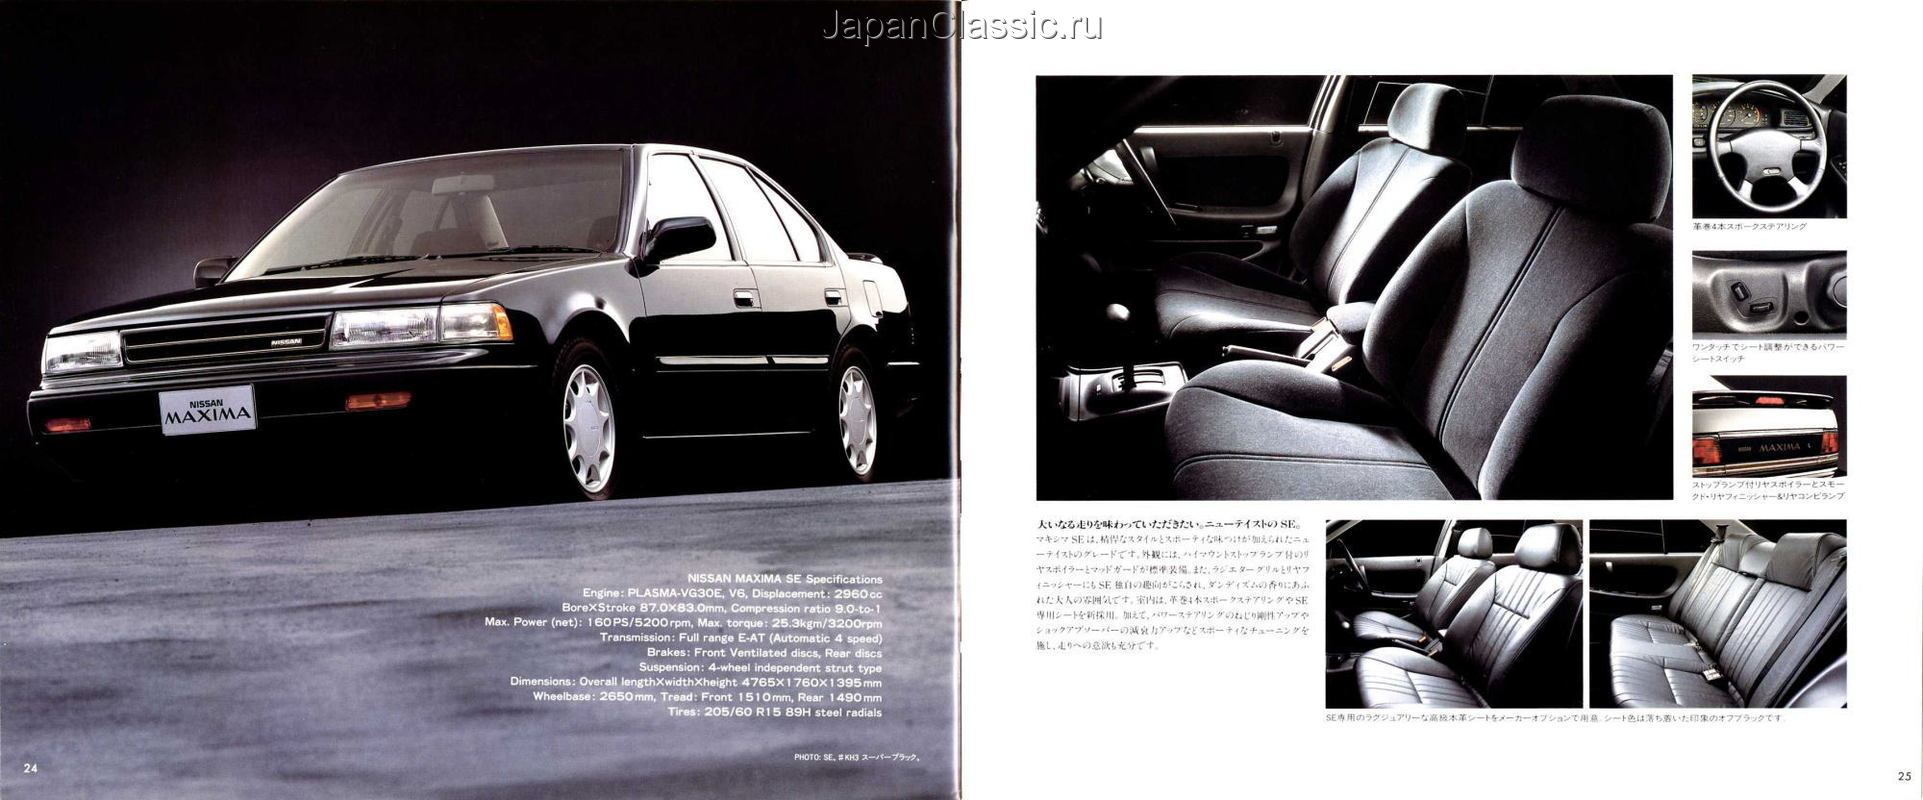 Nissan Maxima 1988 J30 - JapanClassic